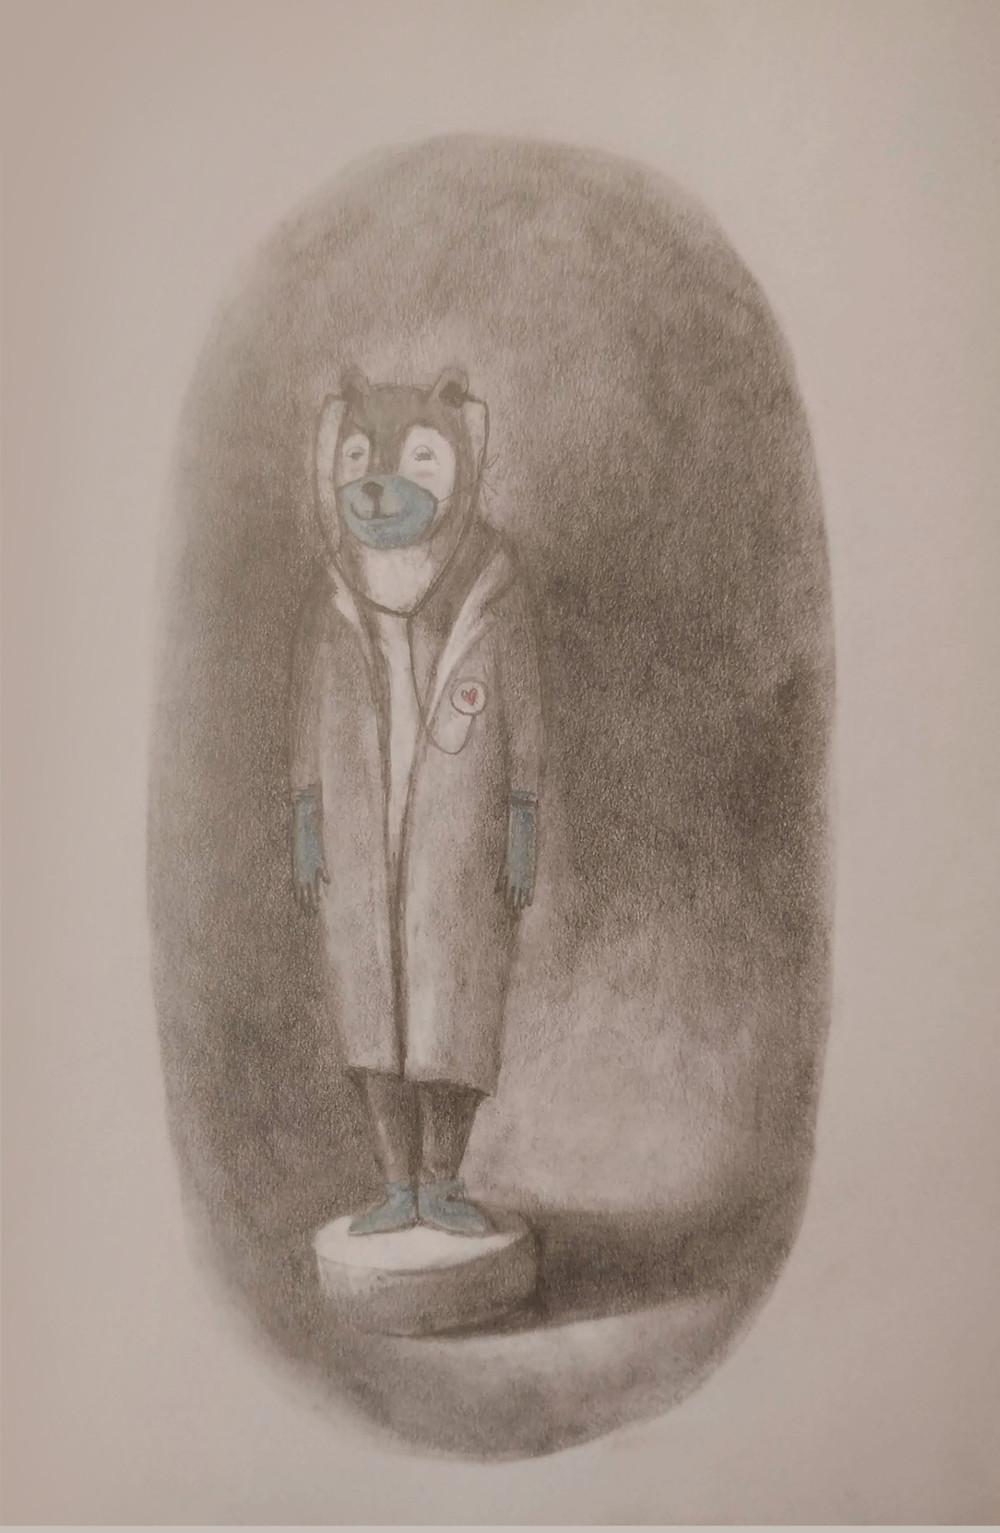 Il medico soldato